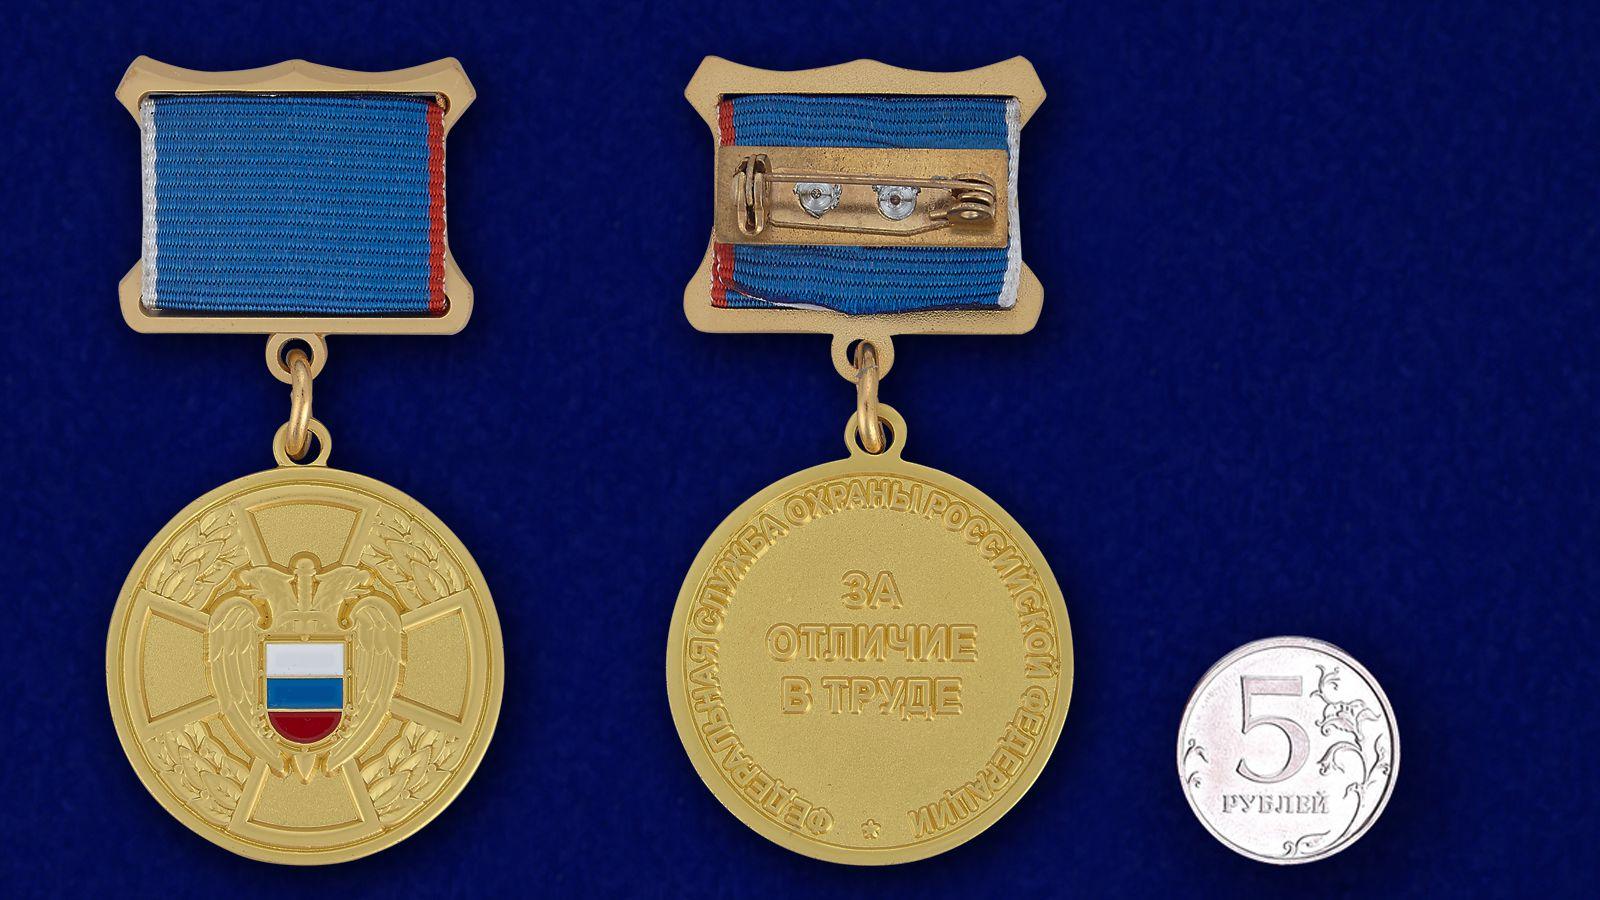 "Цена медали ""За отличие в труде"" (ФСО России)"